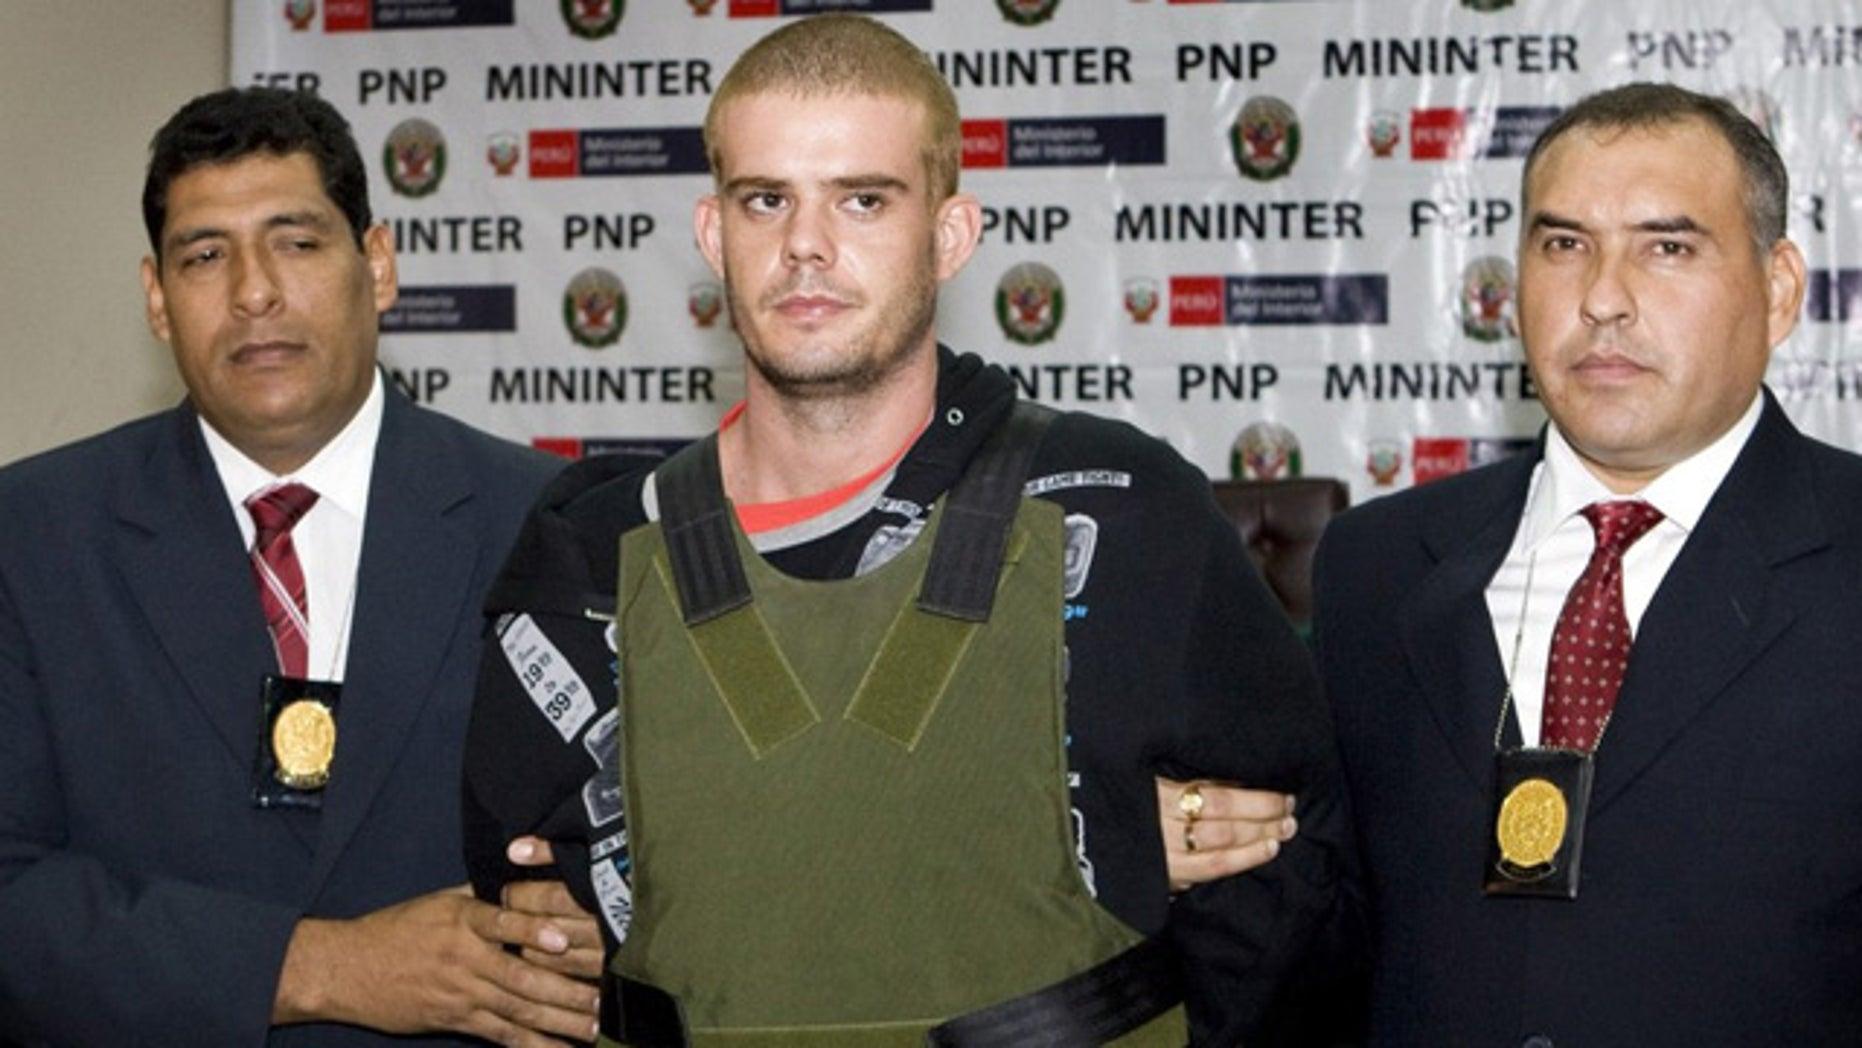 June 5: Joran van der Sloot is escorted by Peruvian police as he arrives at their offices in Lima.